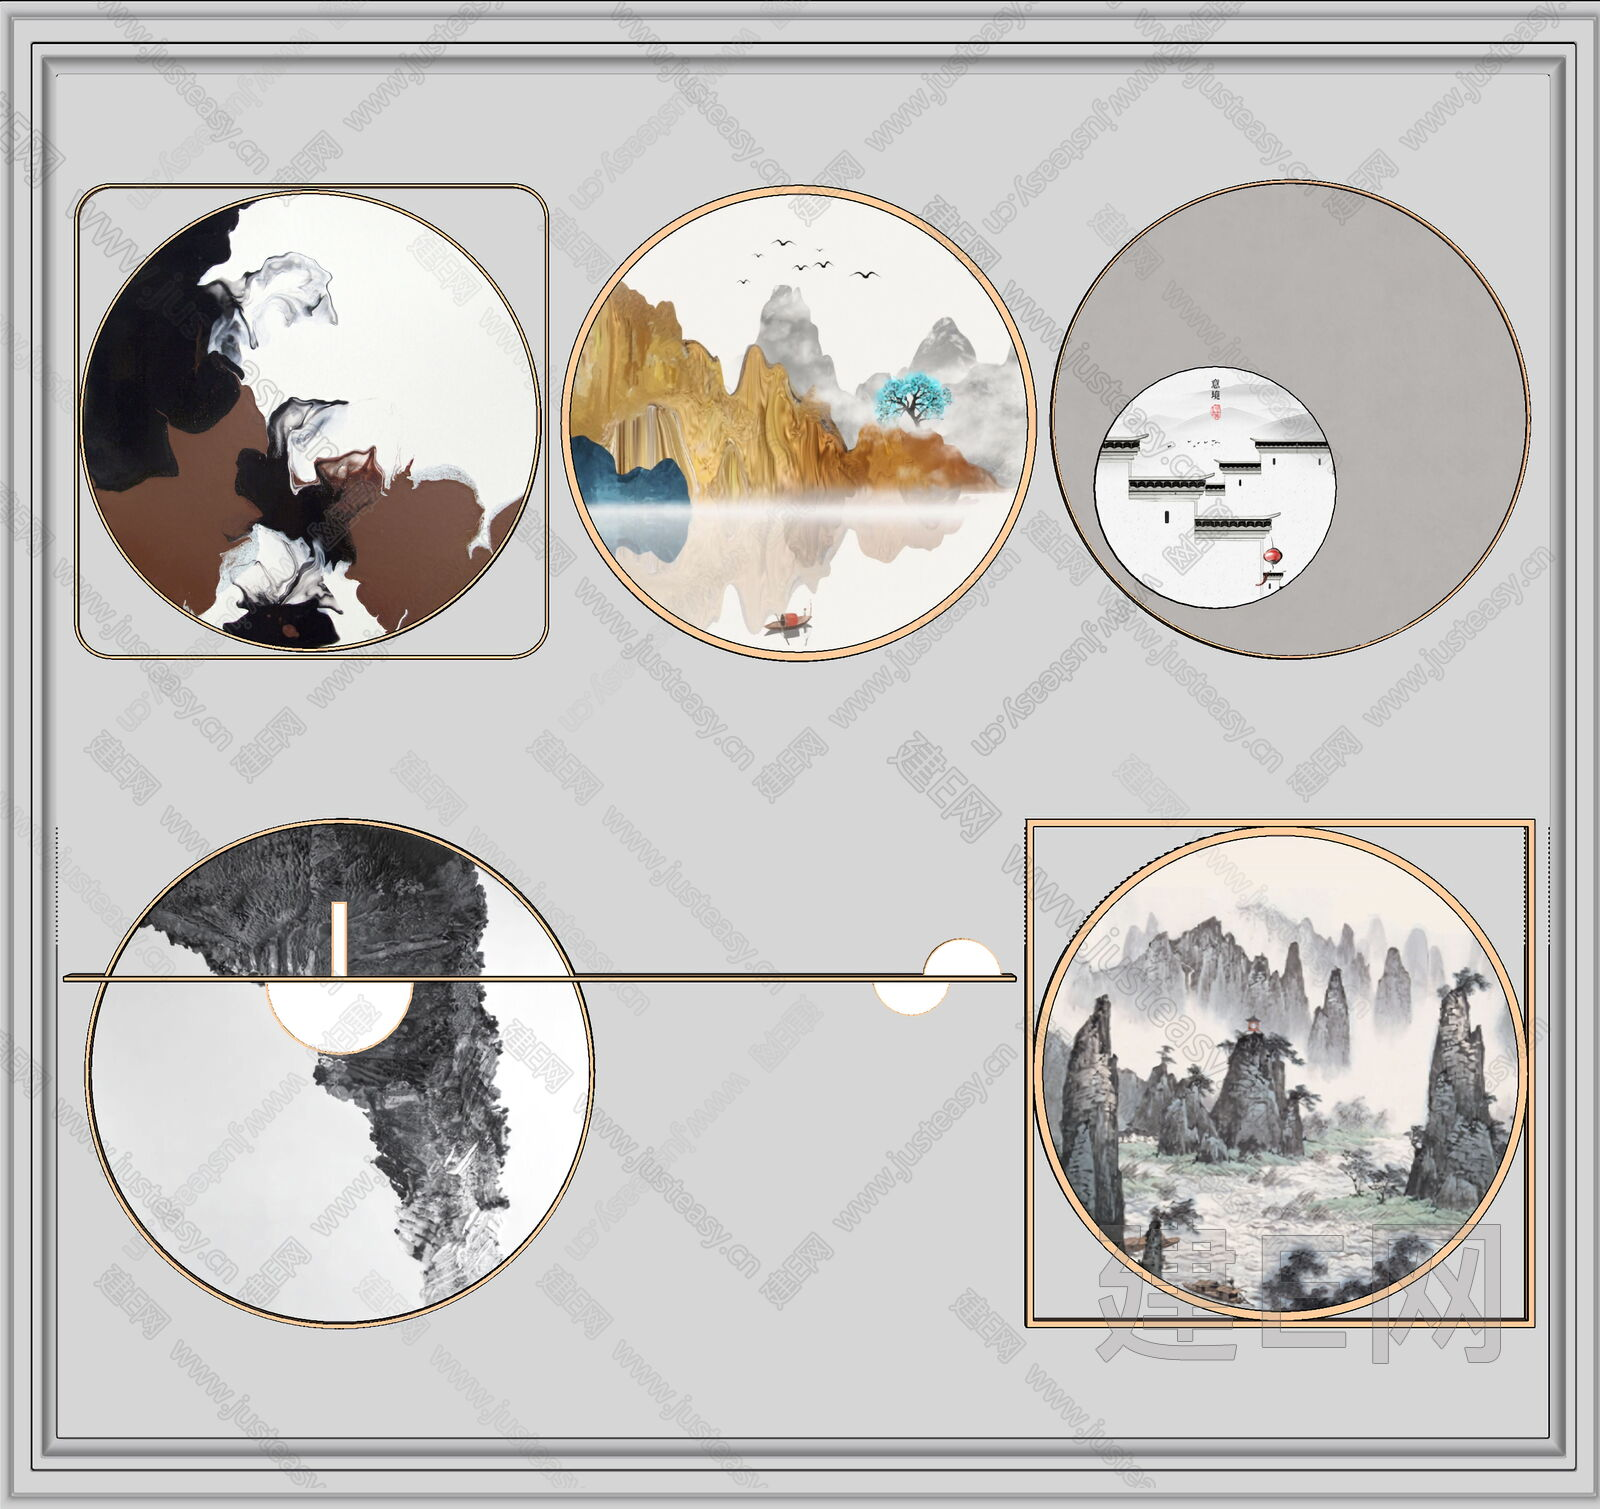 新中式装饰sketchup模型